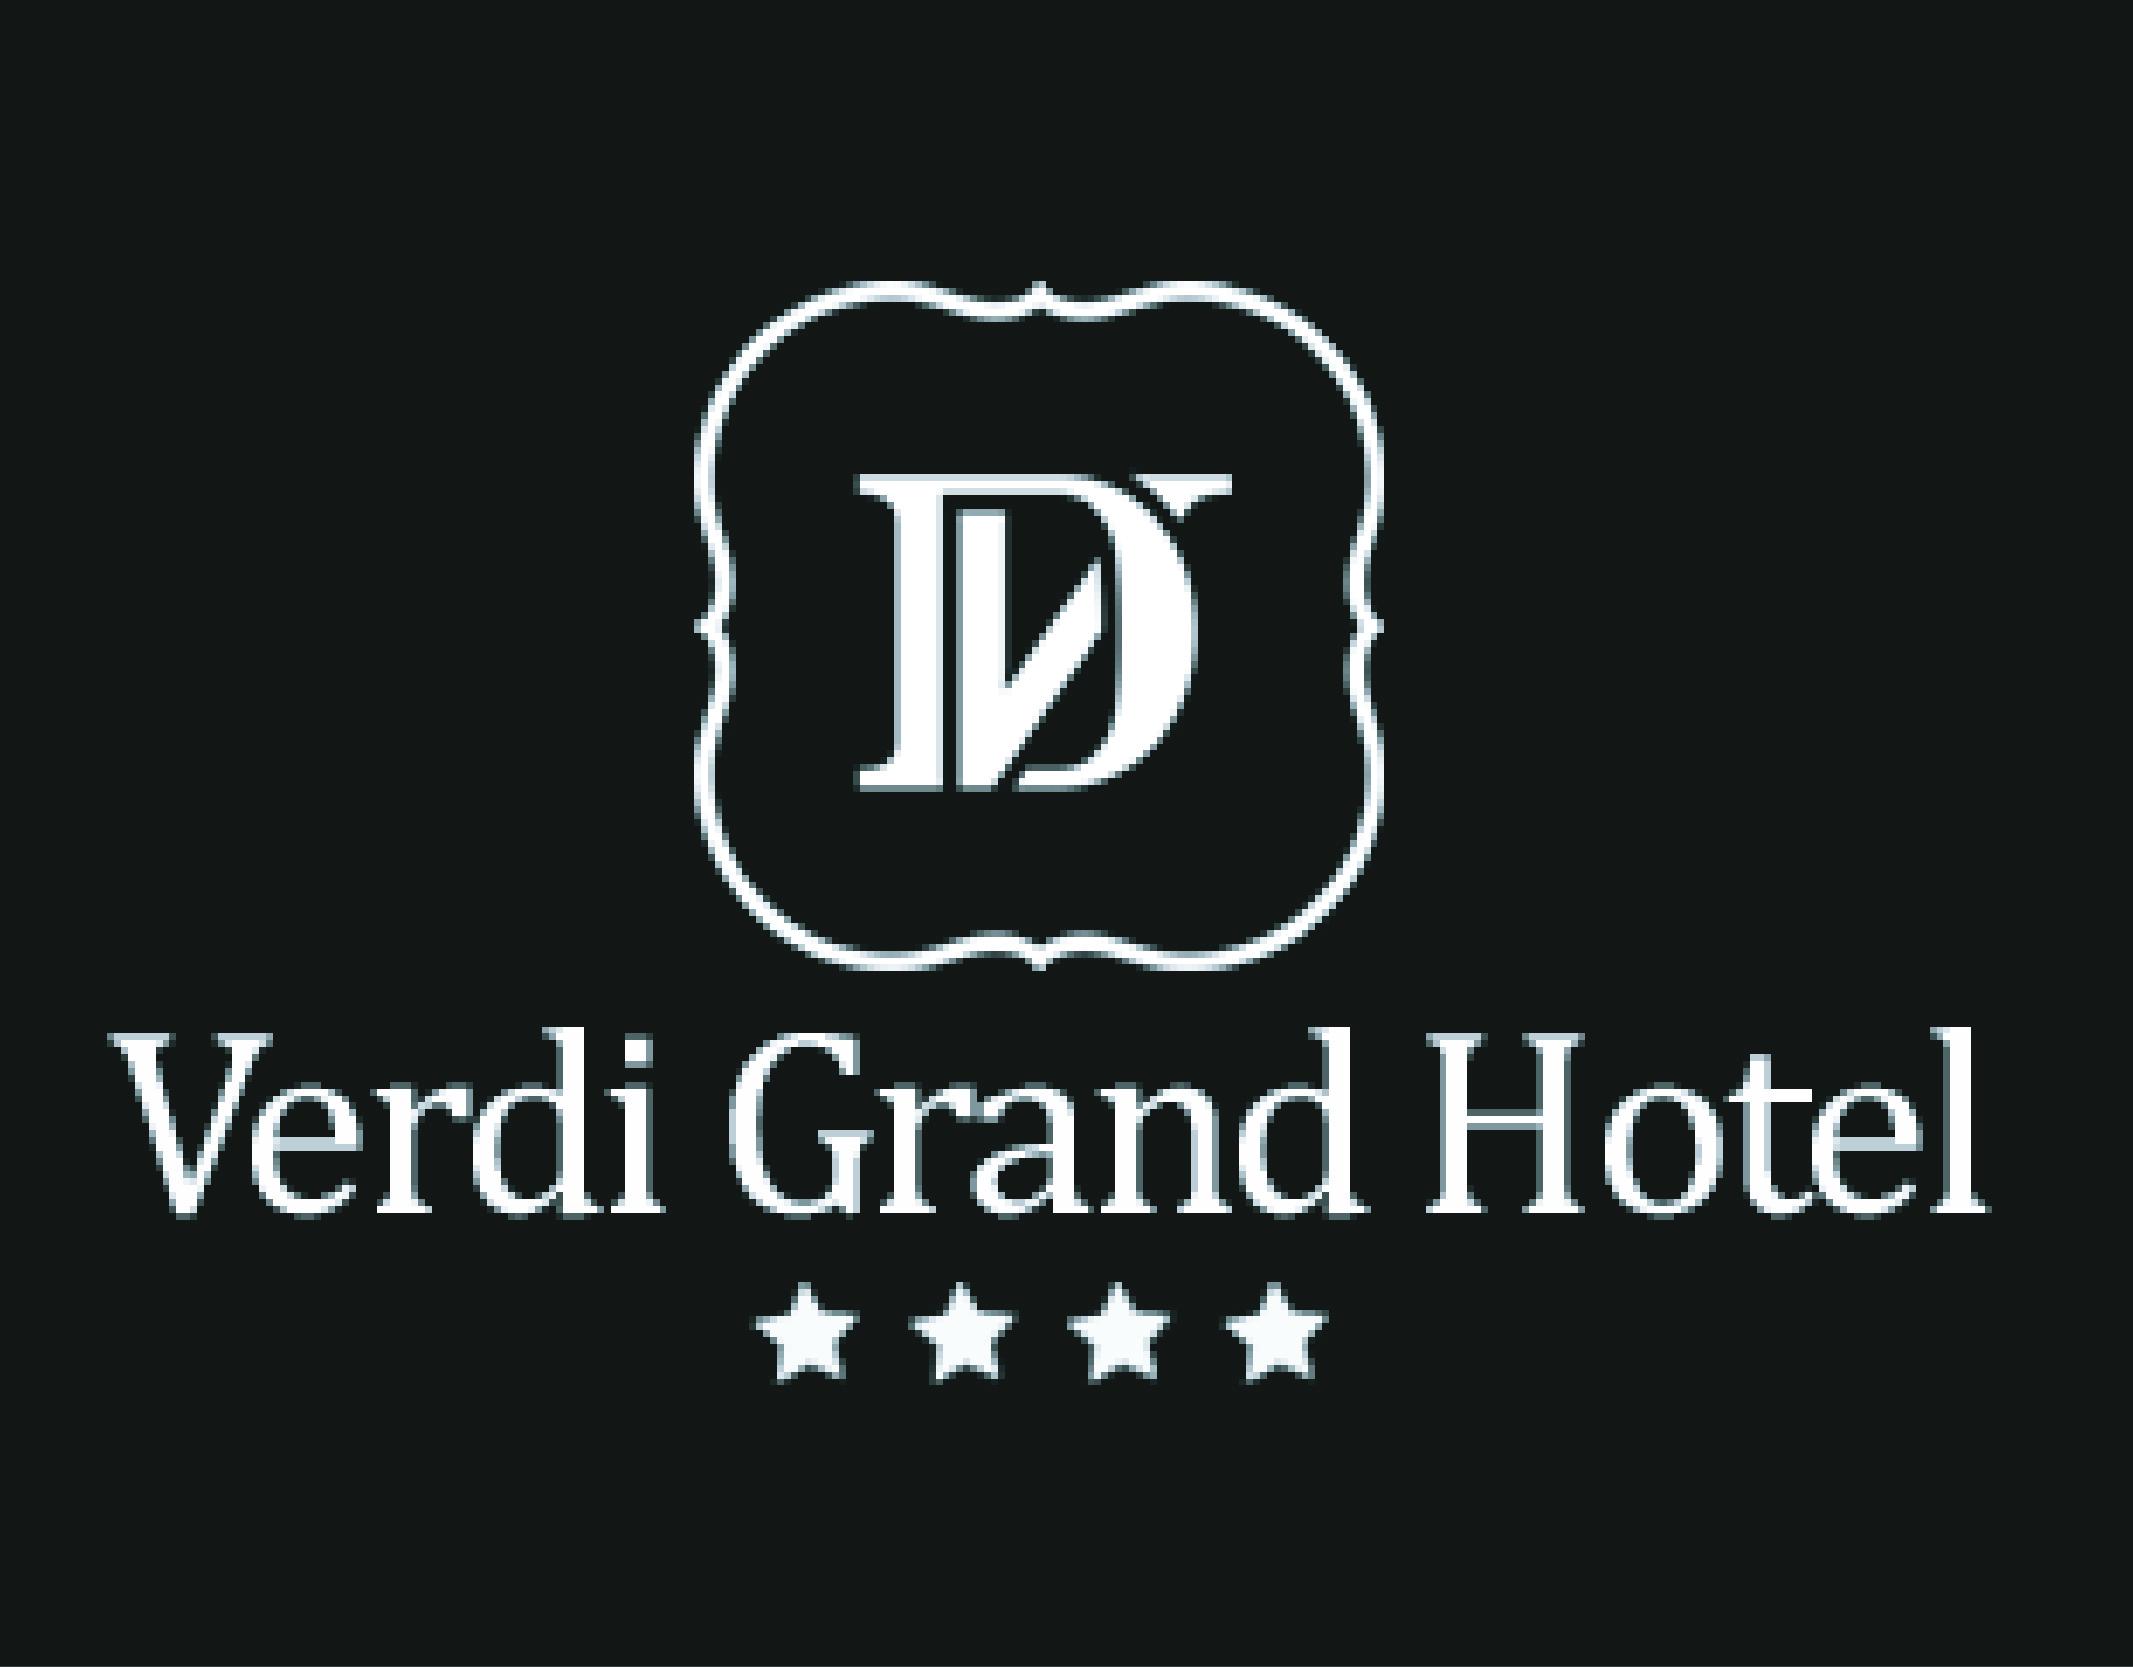 Verdi Grand Hotel